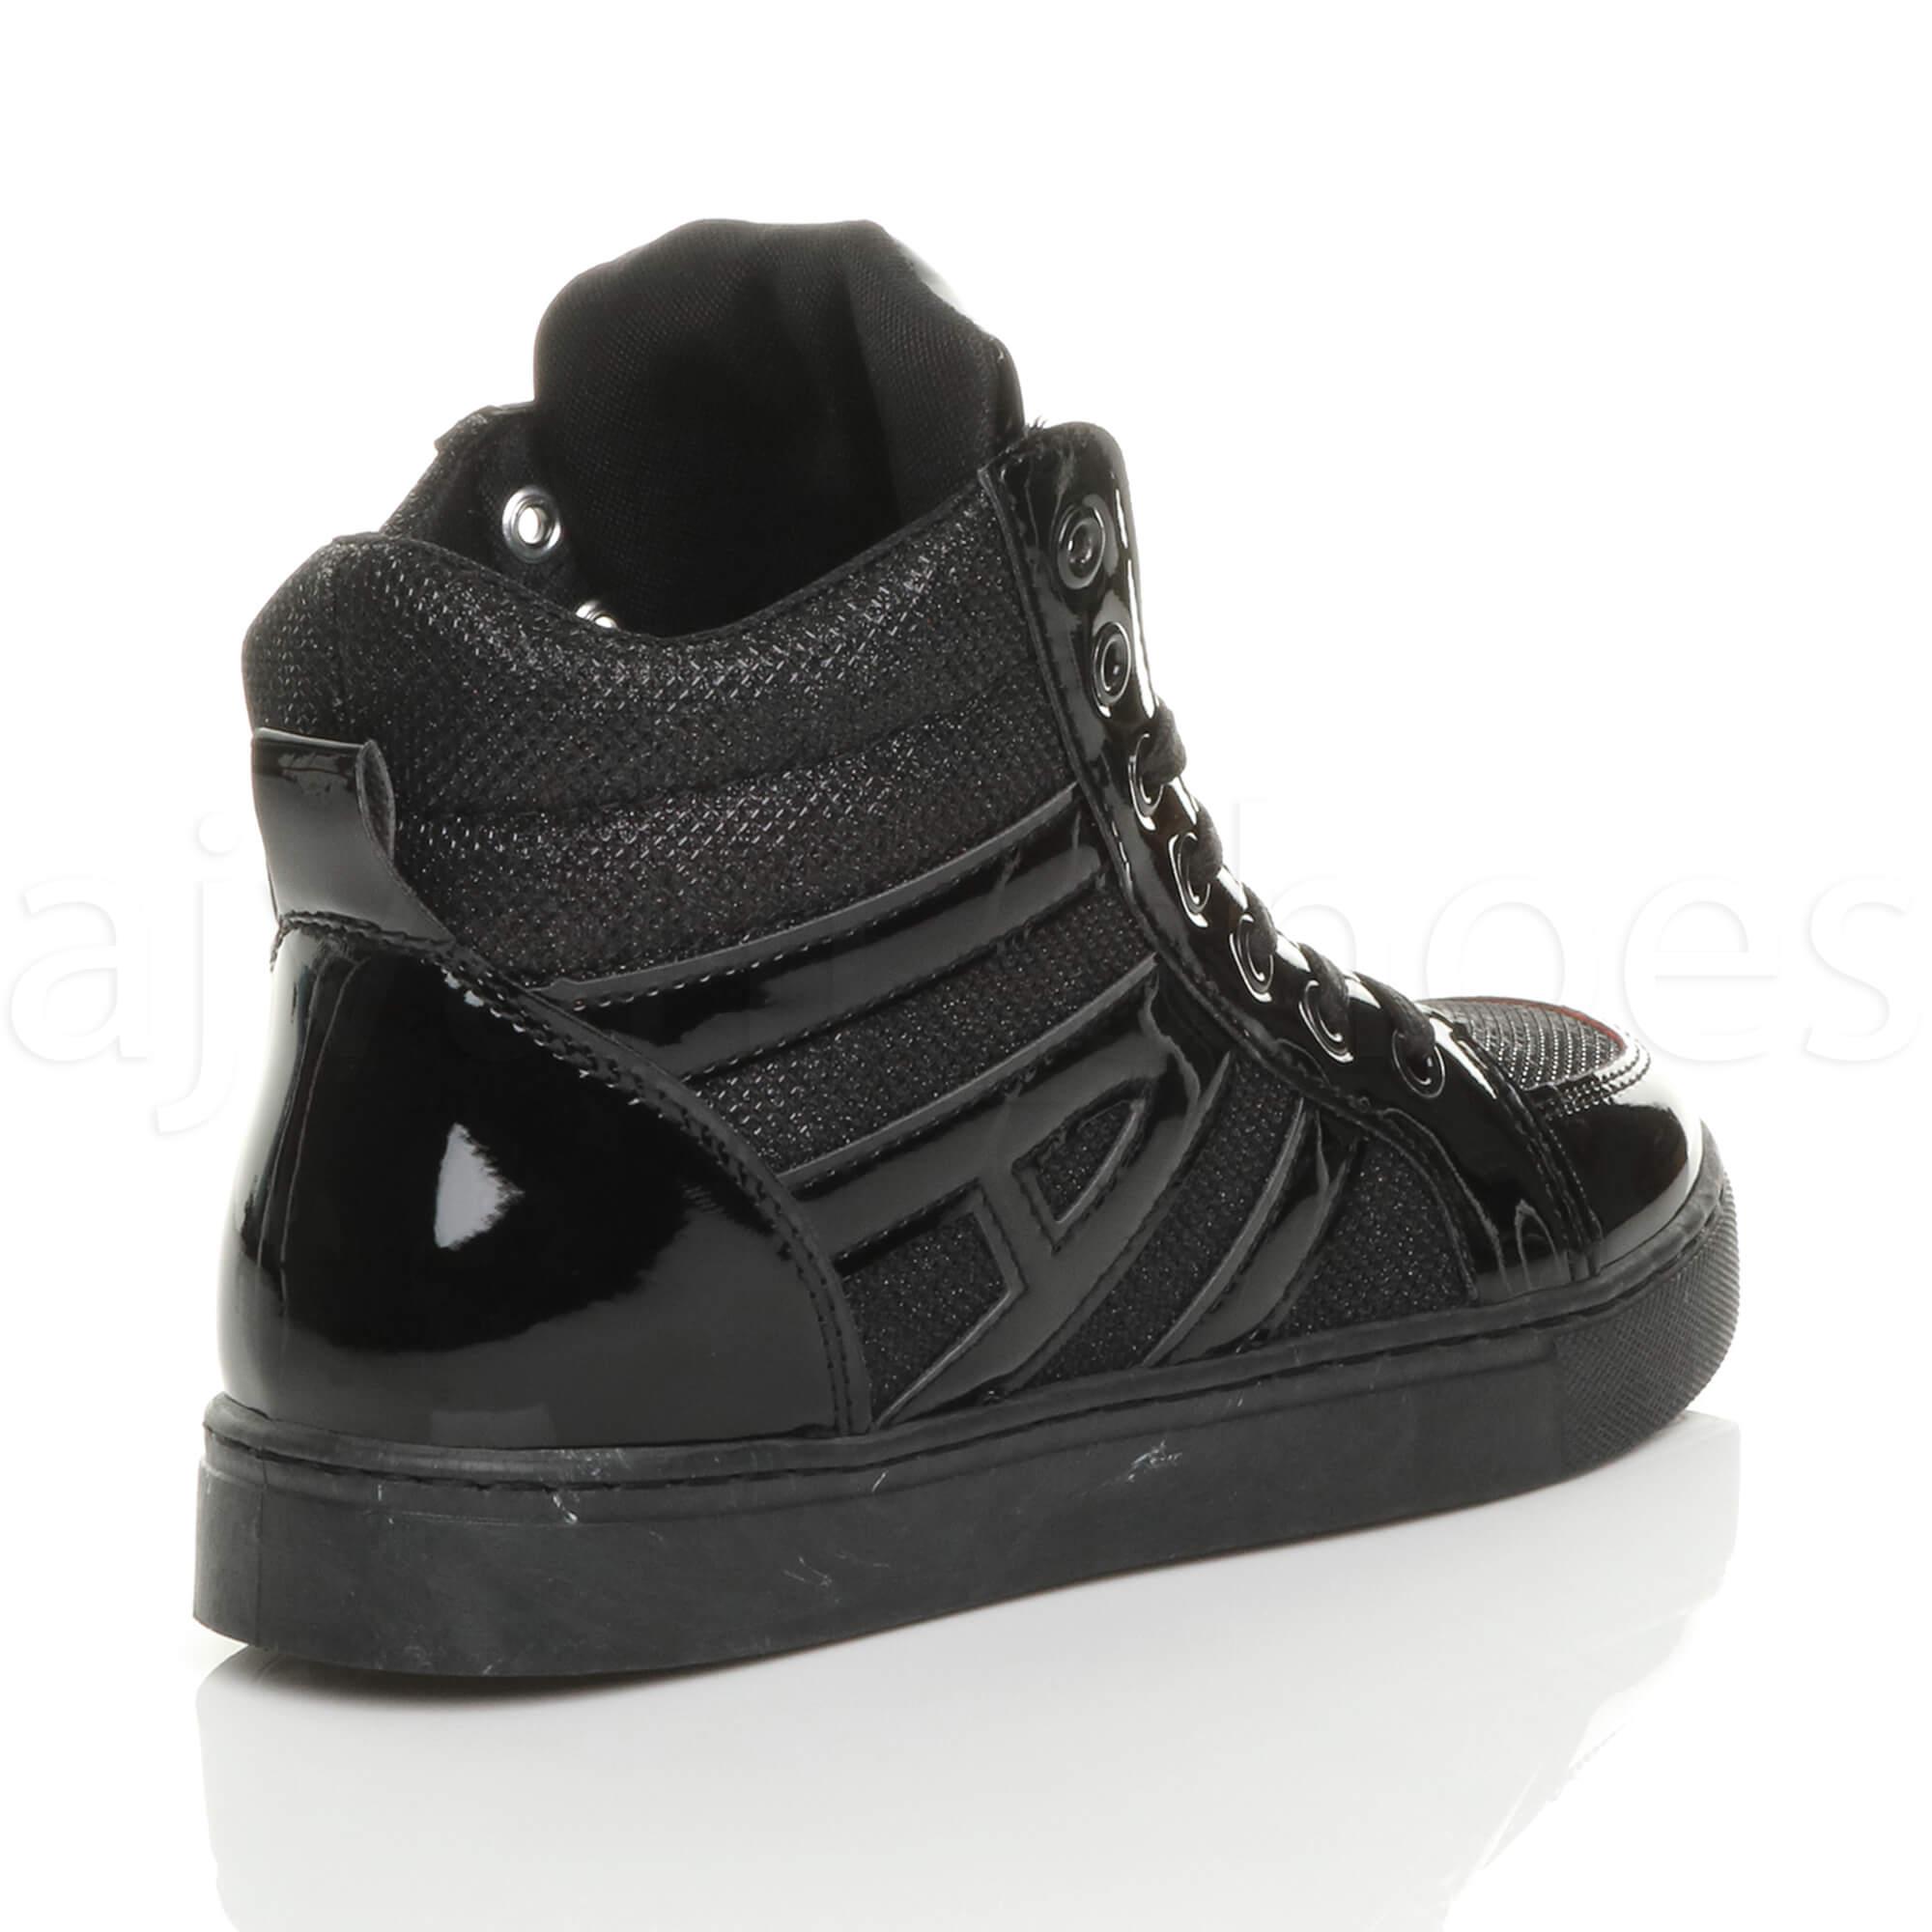 Womens Ladies Flat Lace Up Metallic paillettes Hi-Top Trainers Bottines Boots Size